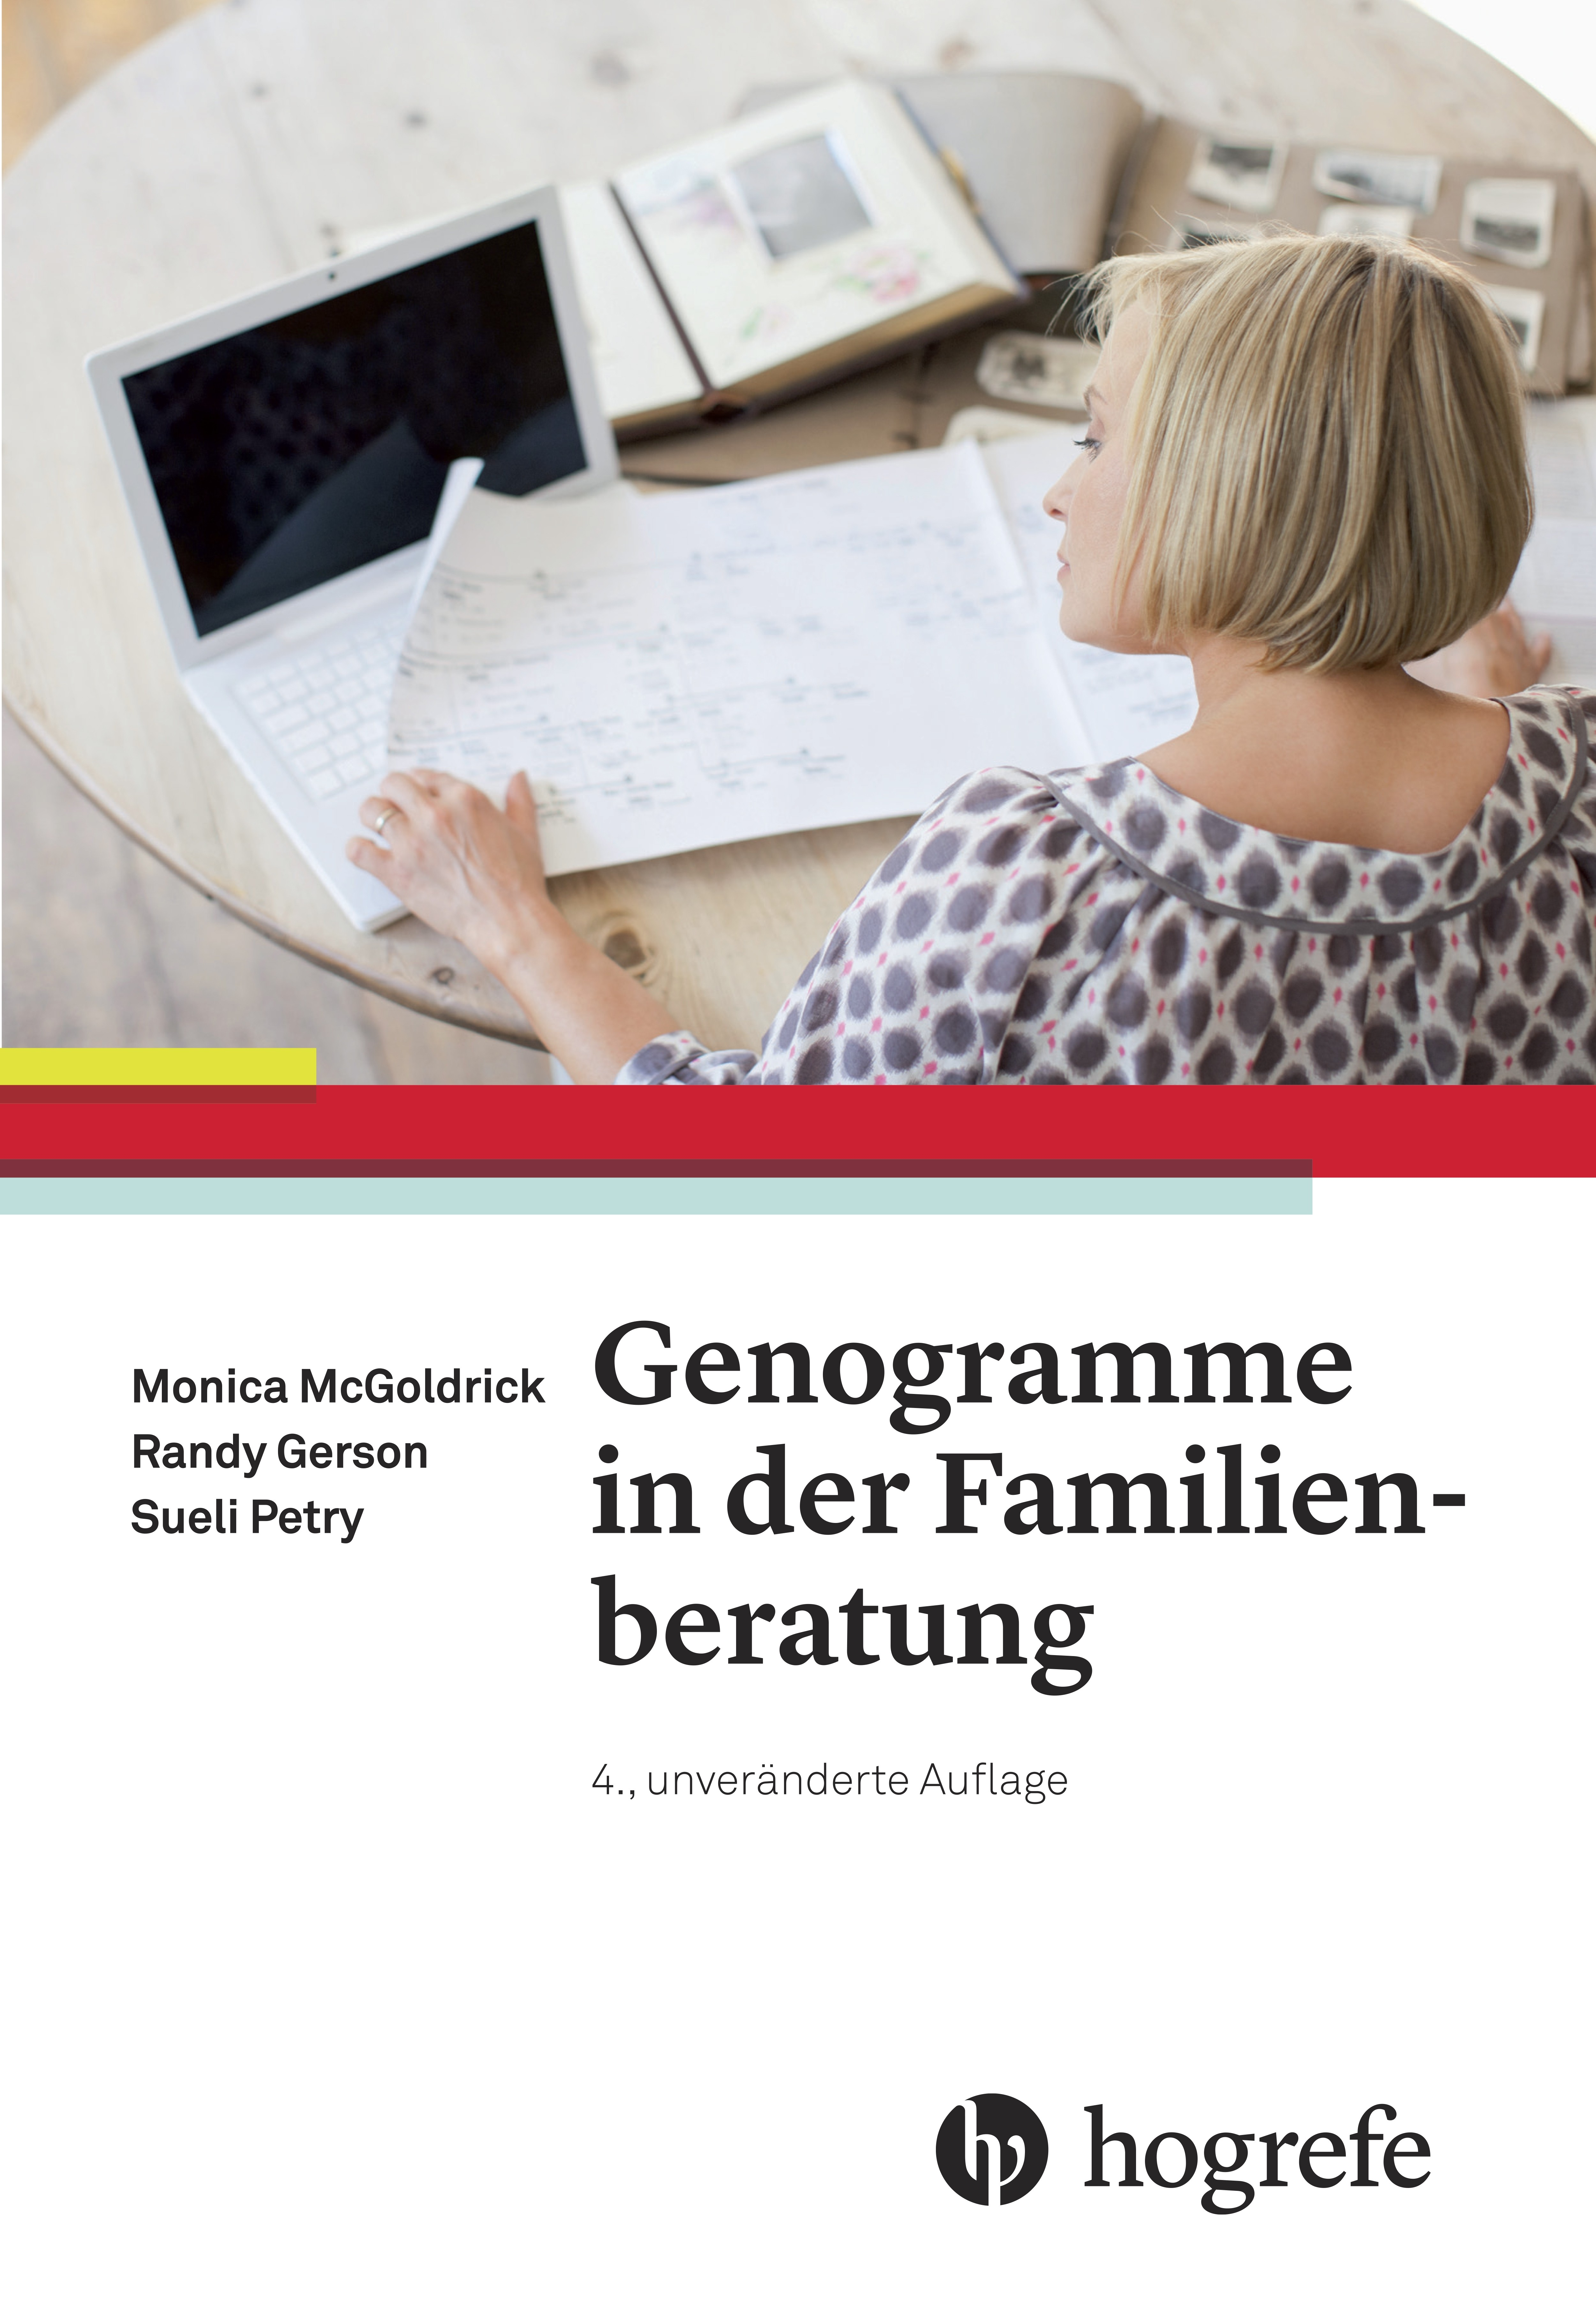 Genogramme in der Familienberatung Monica McGoldrick